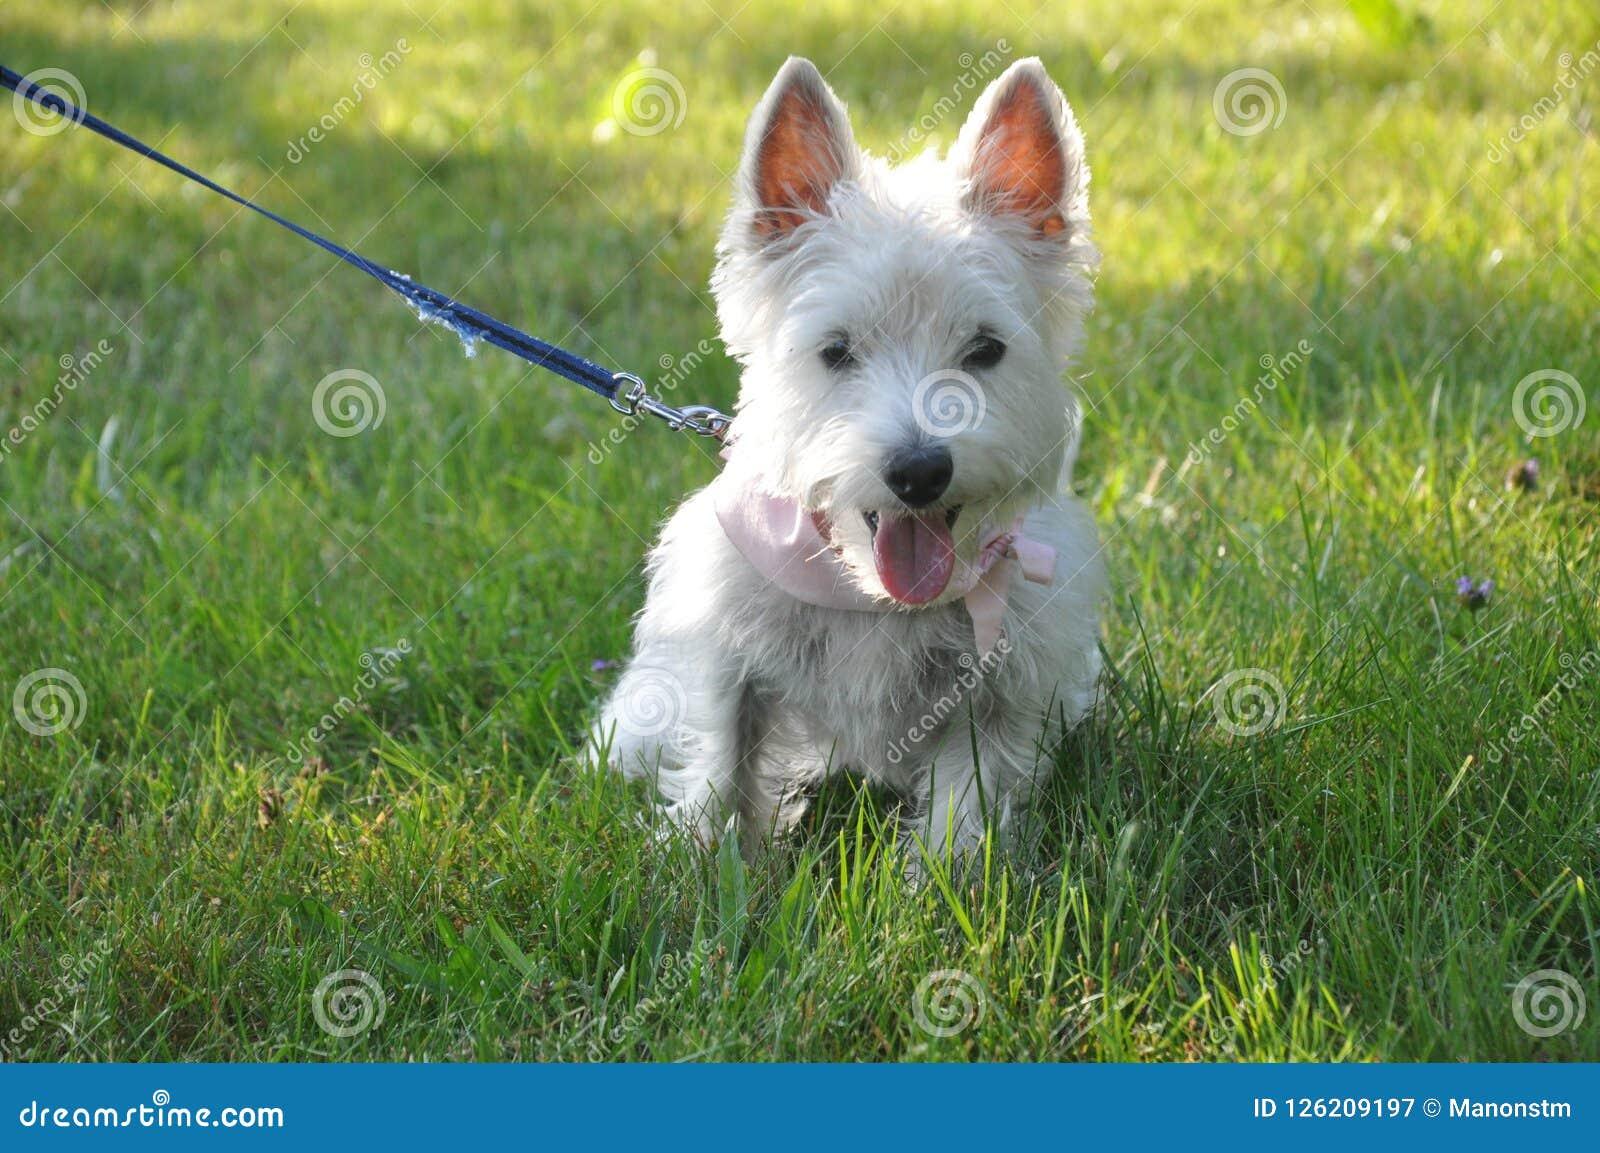 Dans l собака blanc Chien herbe ` белая на траве